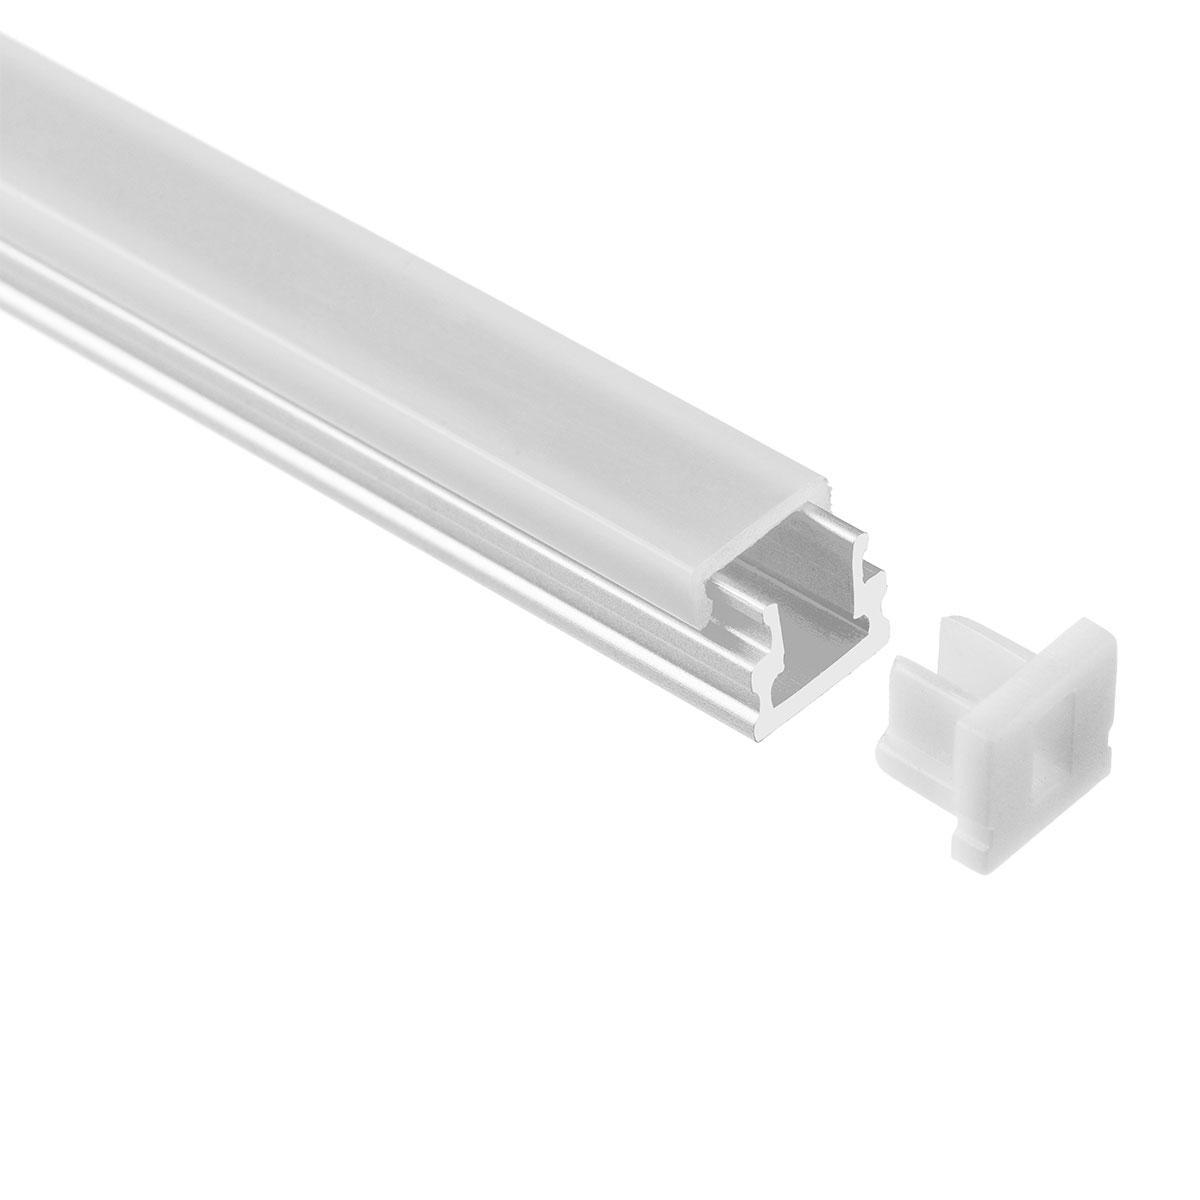 LED Aufbau U-Profil eloxiert 8 x 7,8mm opal 200cm